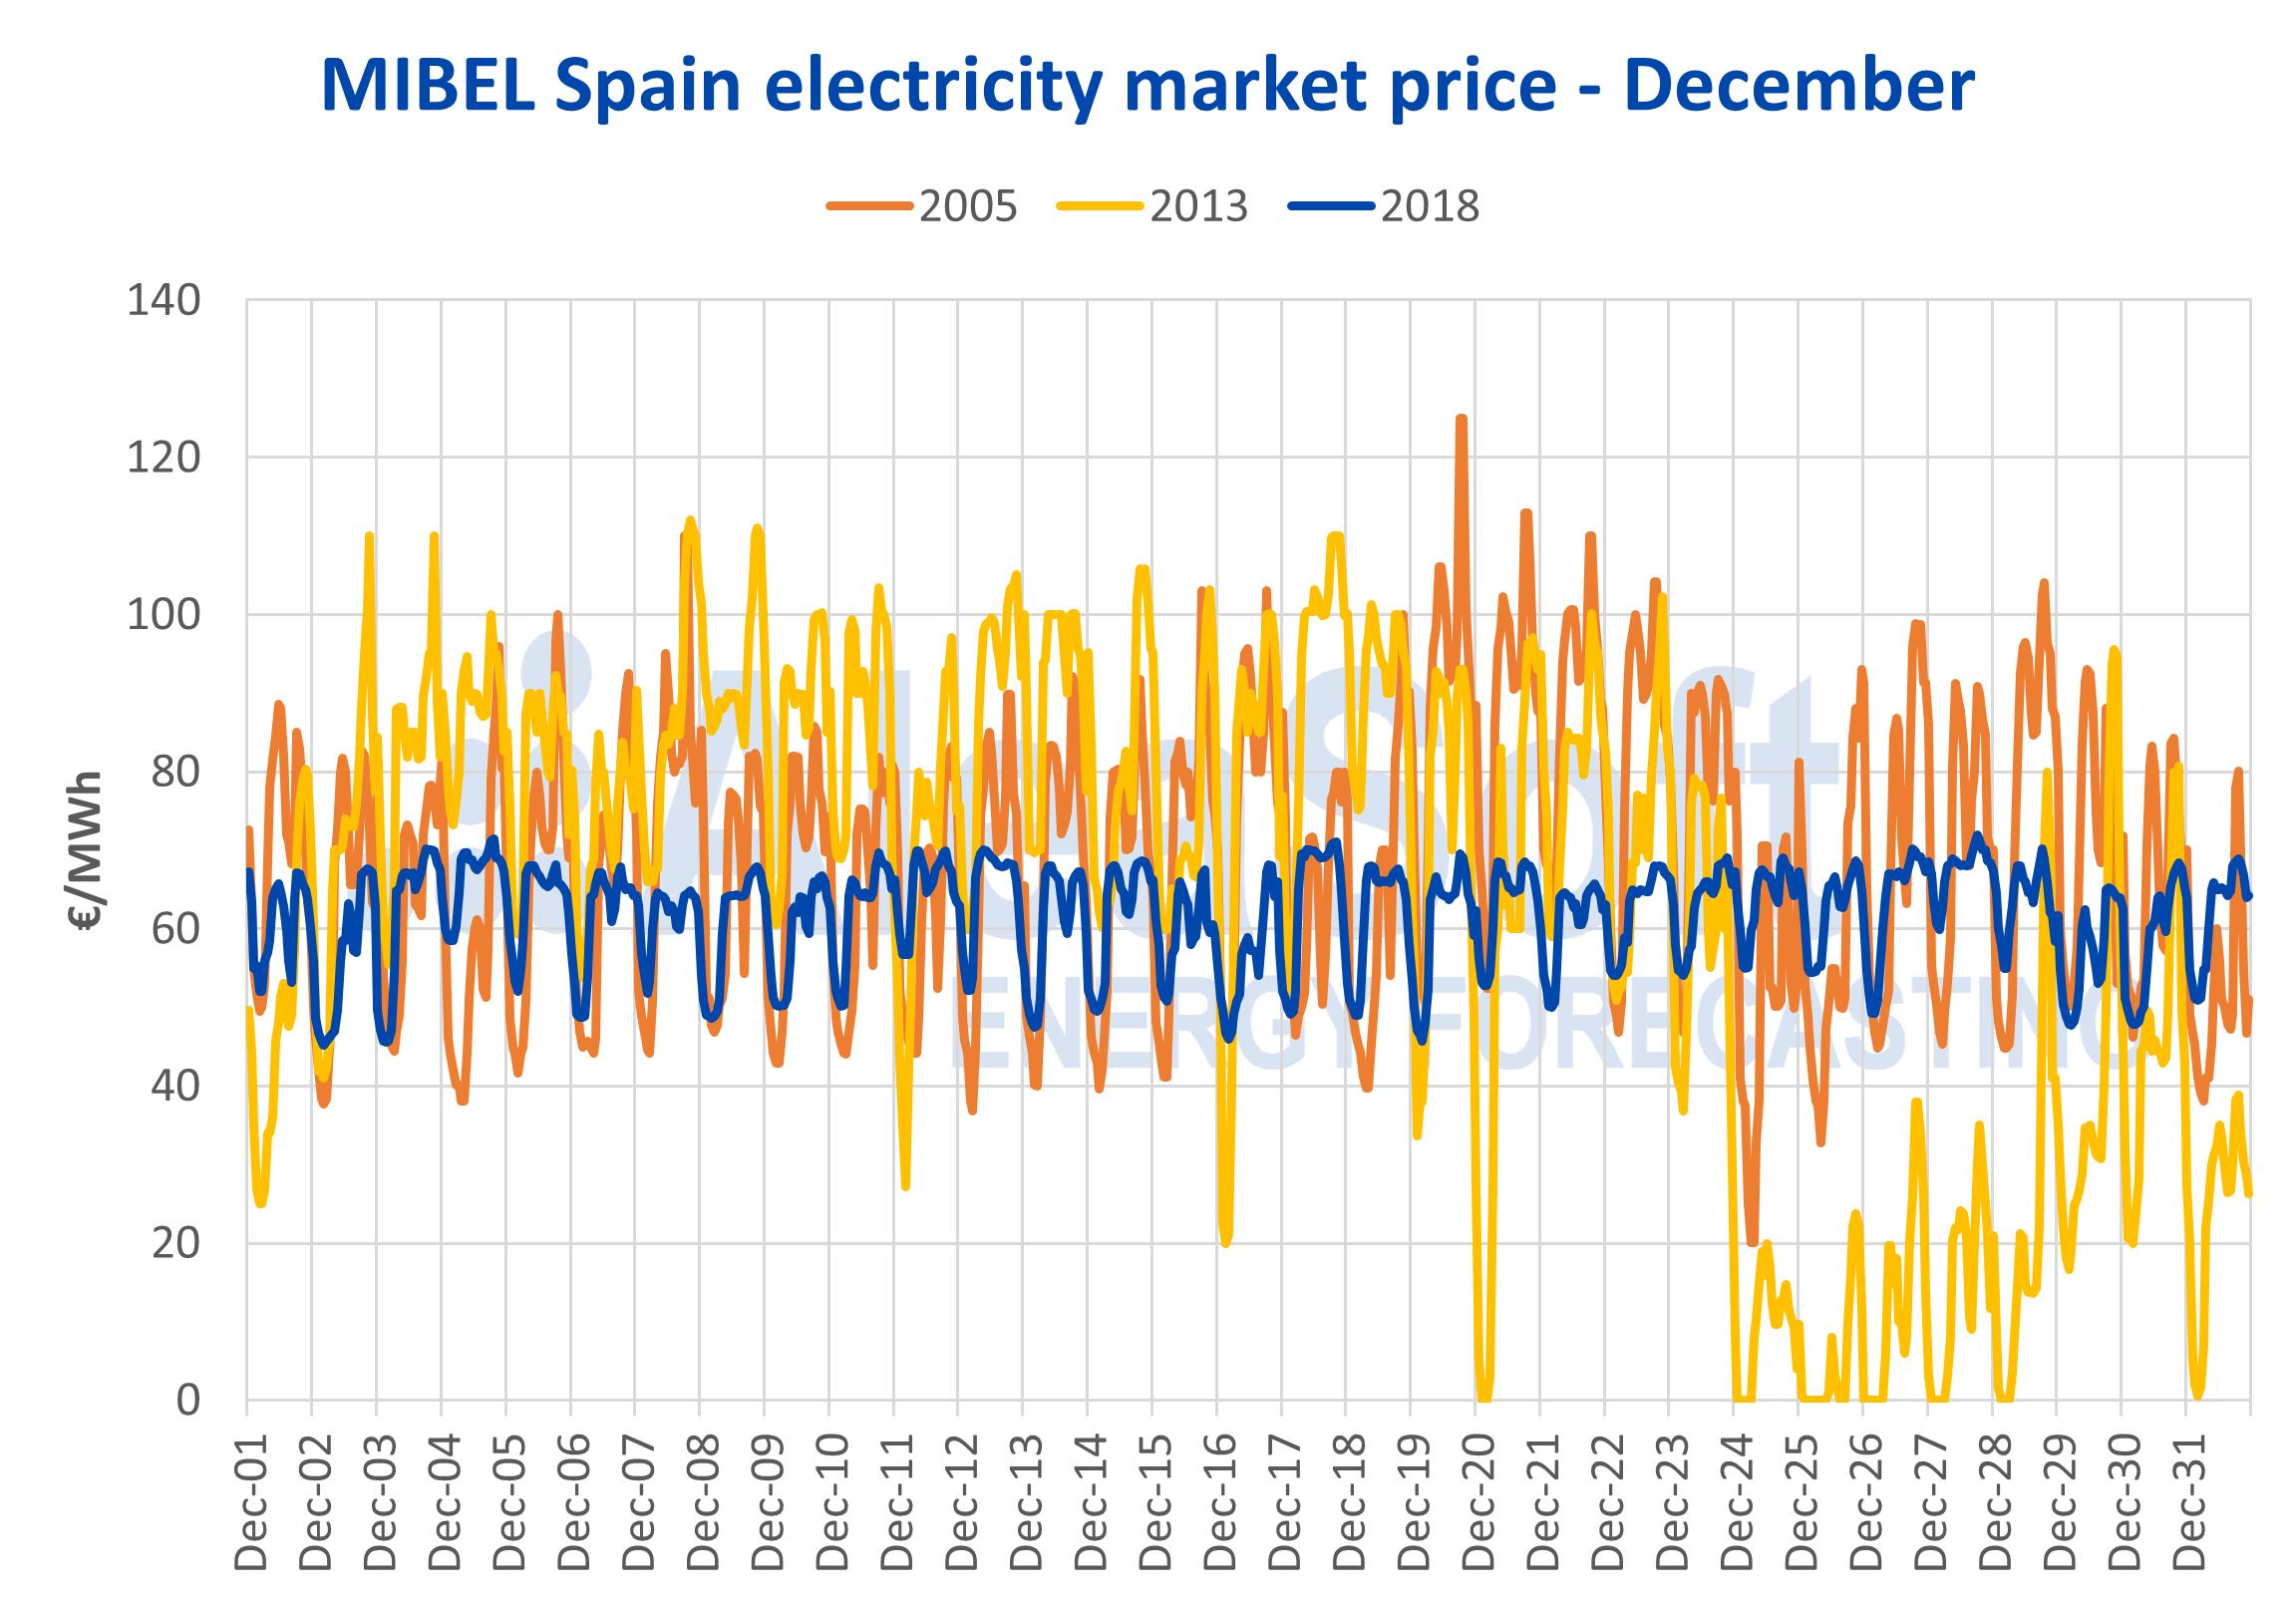 AleaSoft - Electricity market price MIBEL